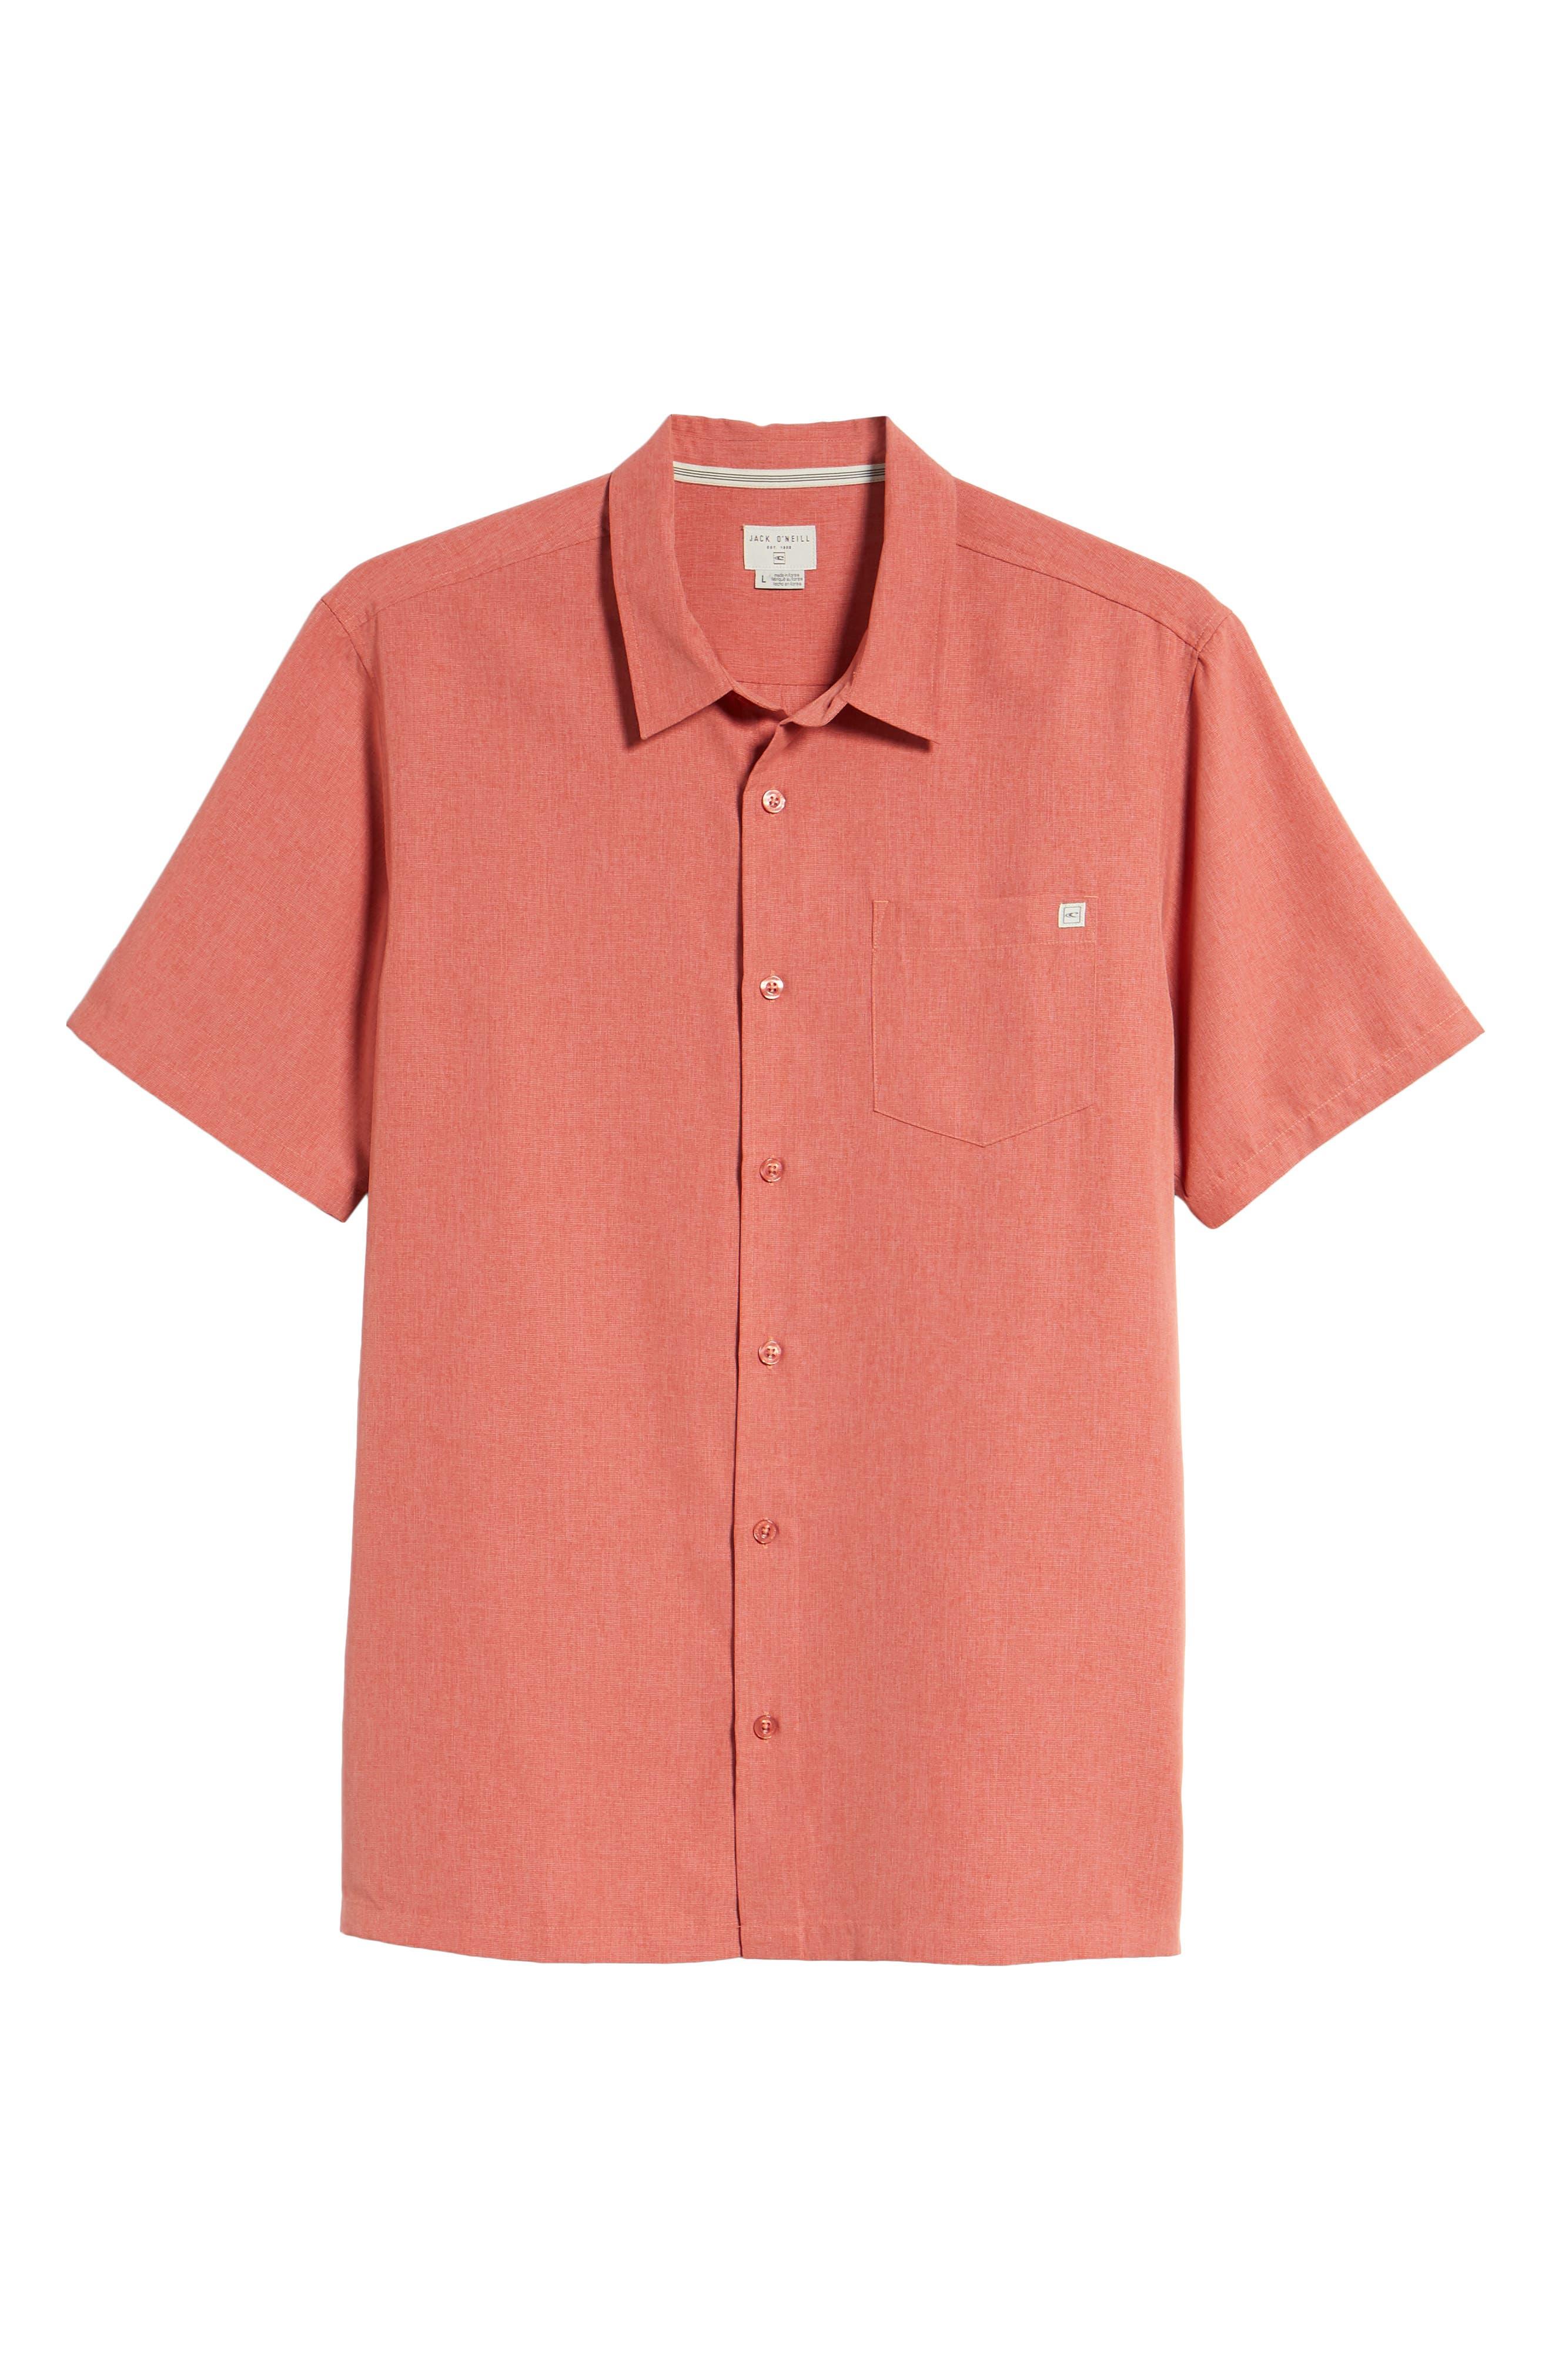 Liberty Sport Shirt,                             Alternate thumbnail 6, color,                             214